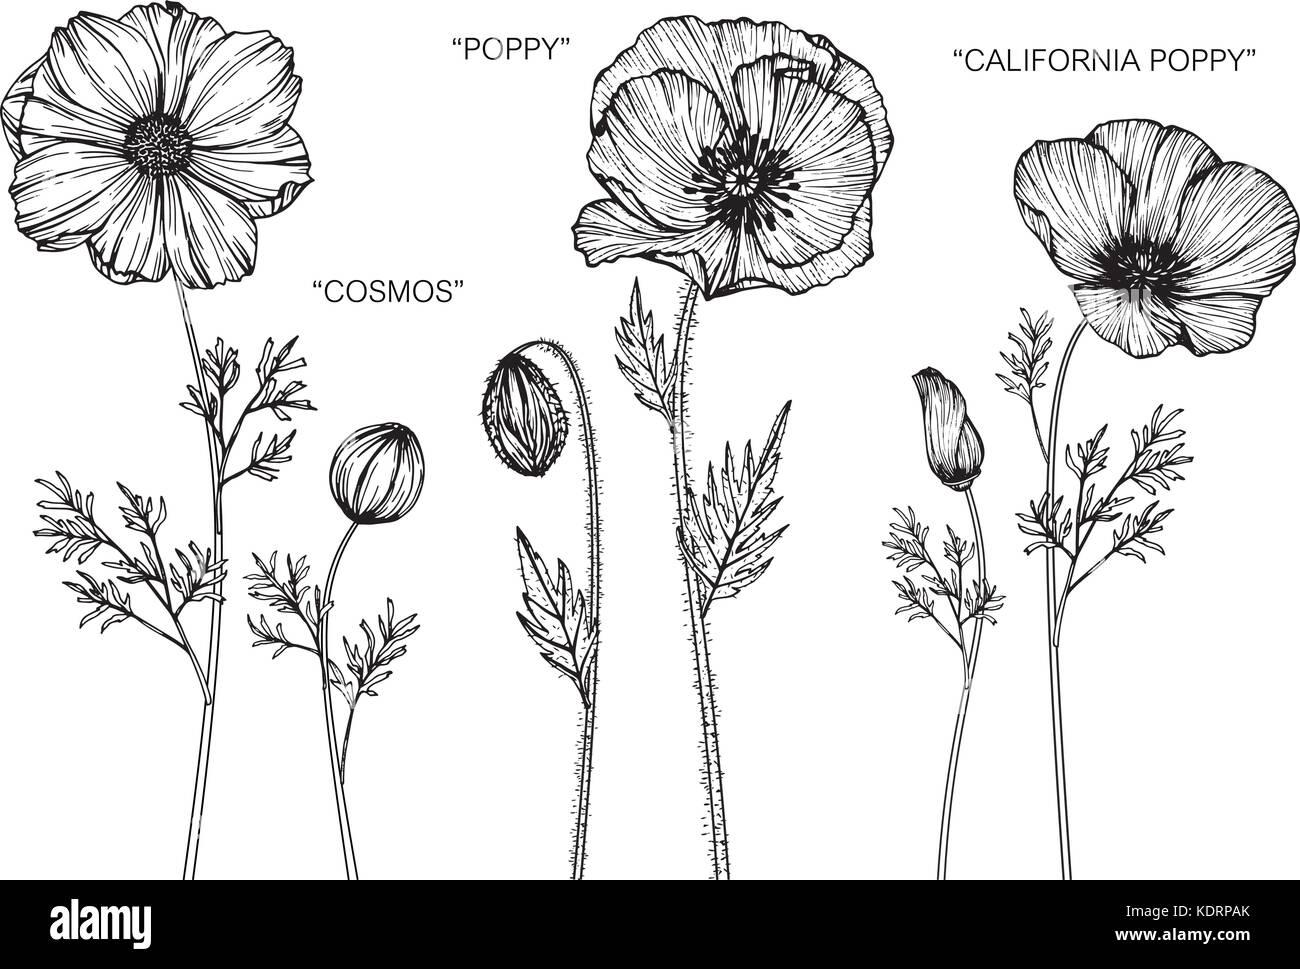 Cosmos Poppy California Poppy Flower Drawing Illustration Black